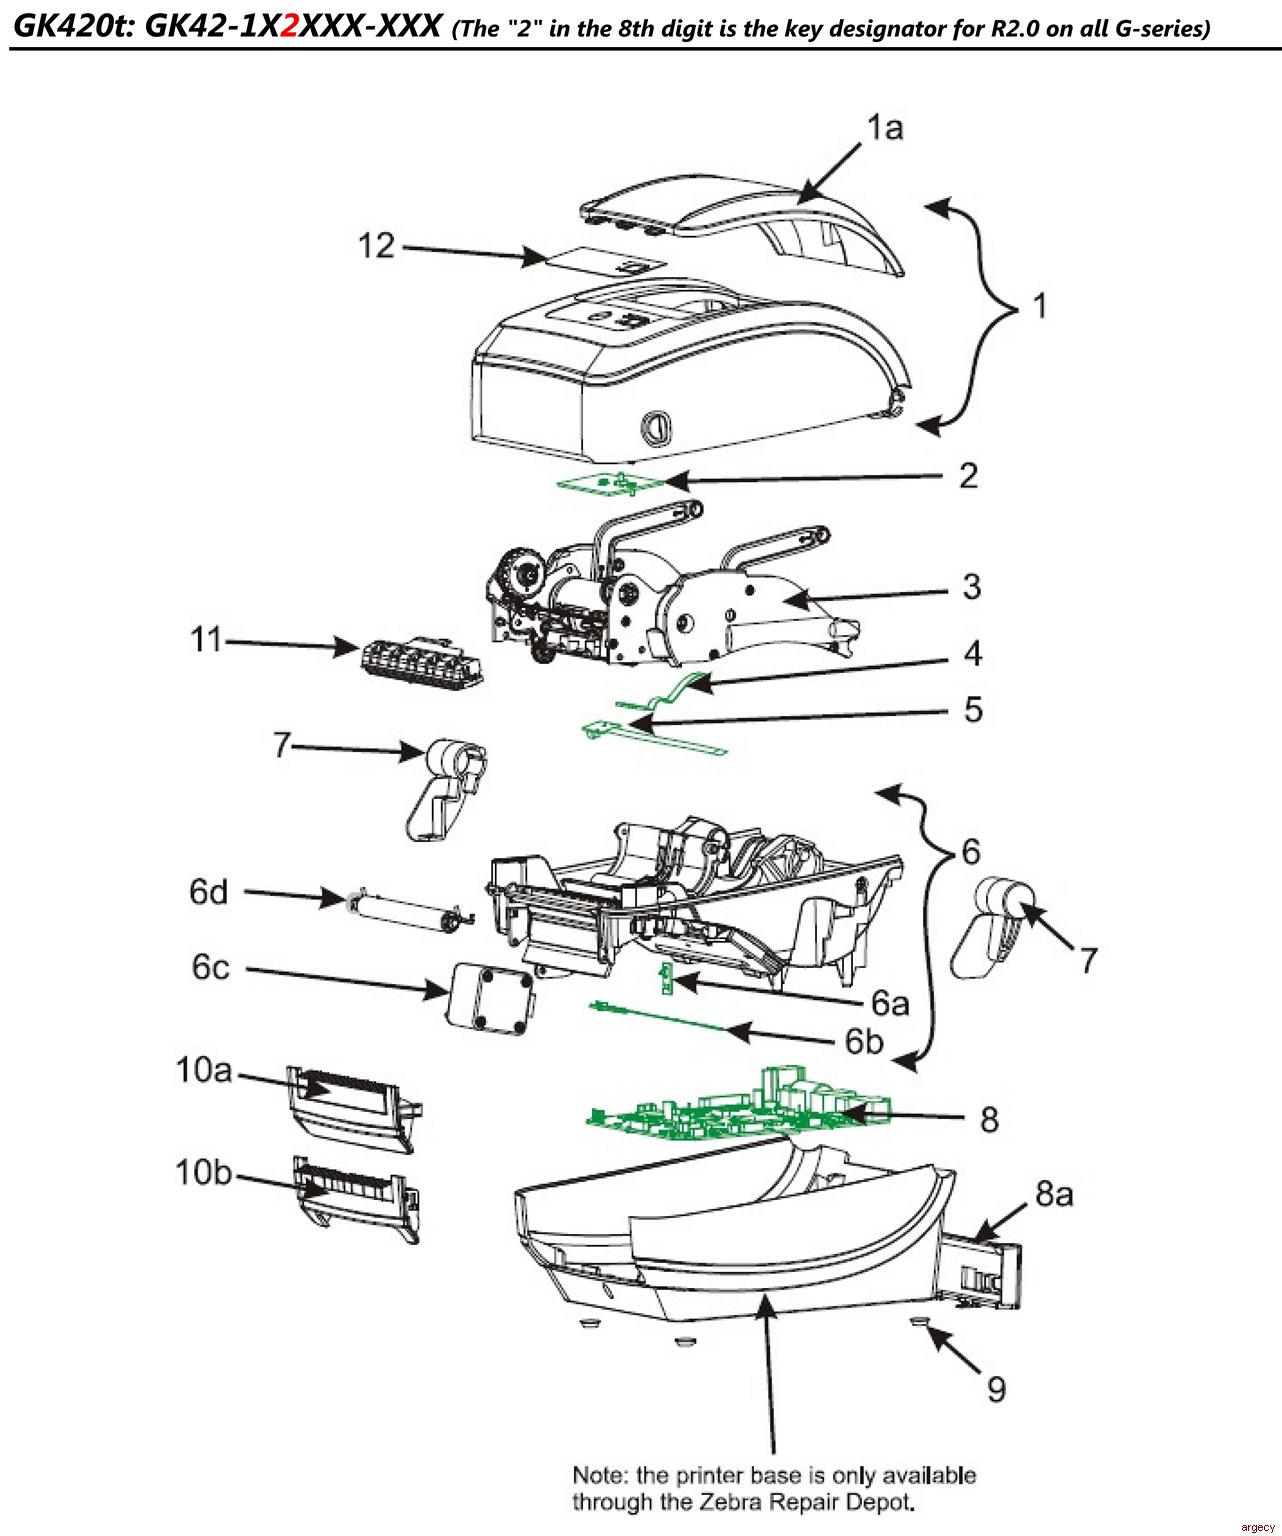 http://www.argecy.com/images/GK420d_GK420t_GX420d_GX420t_GX430t_Parts-4_cr.jpg